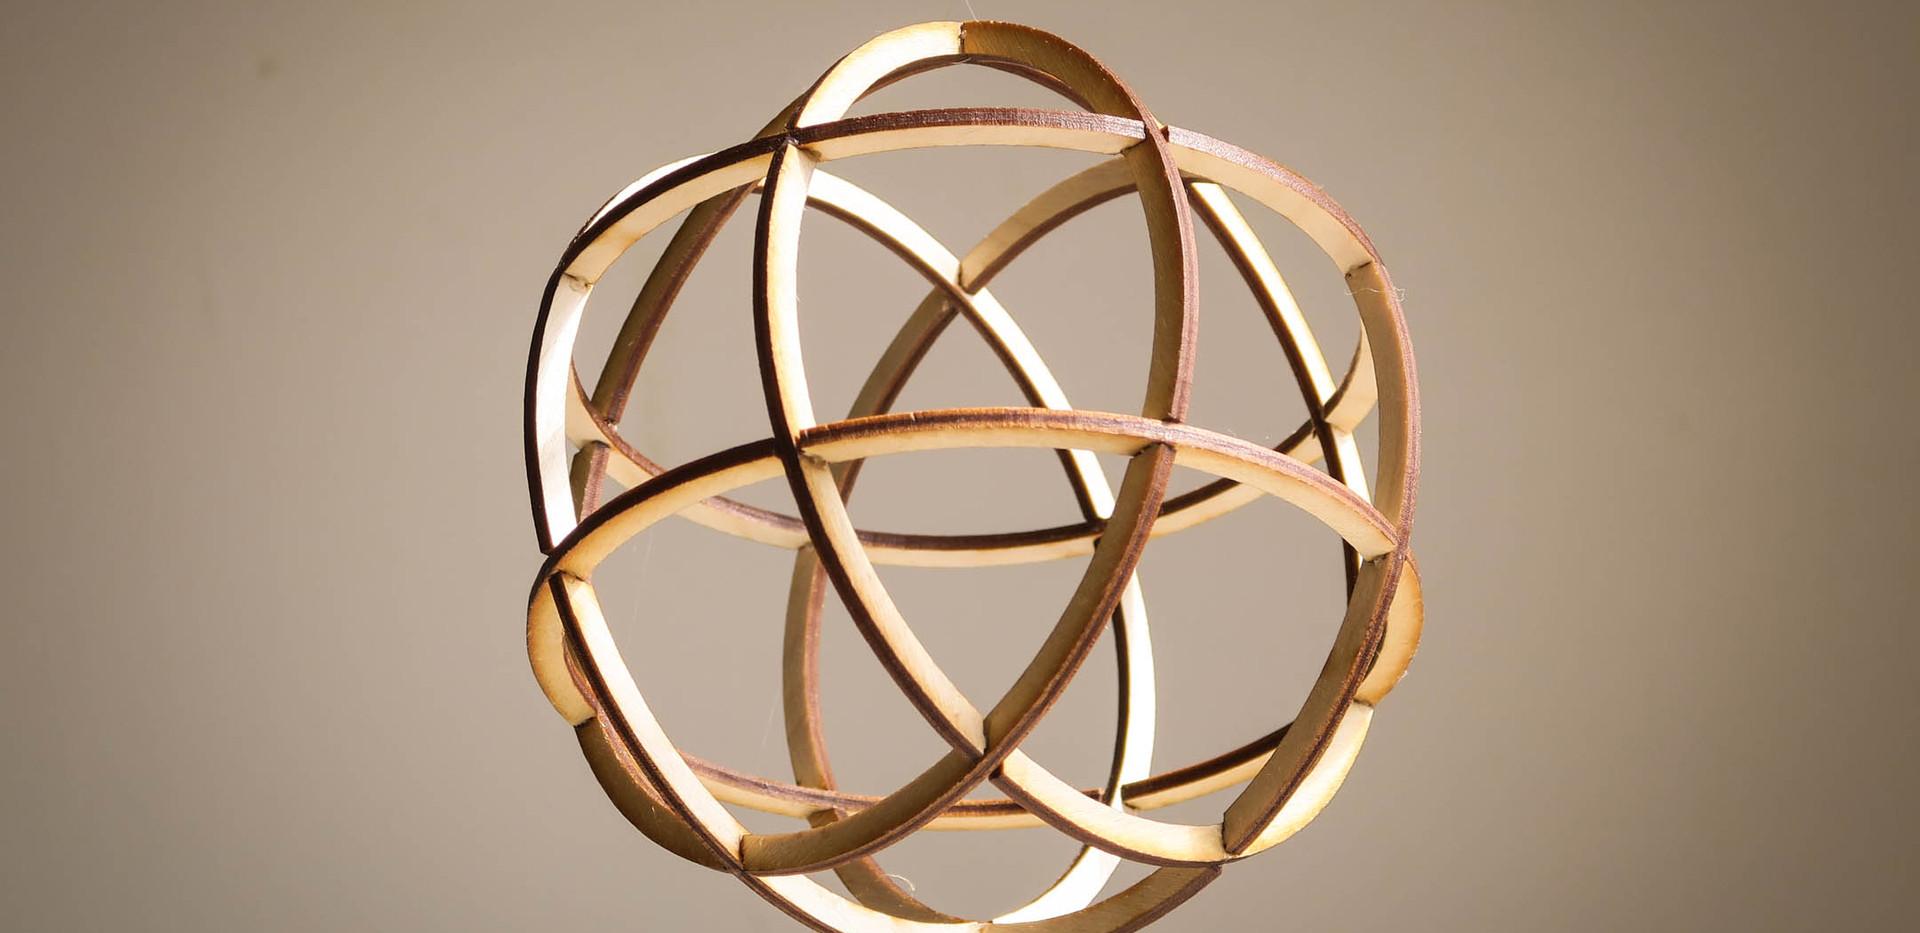 Embryonic Terra Prana Circles